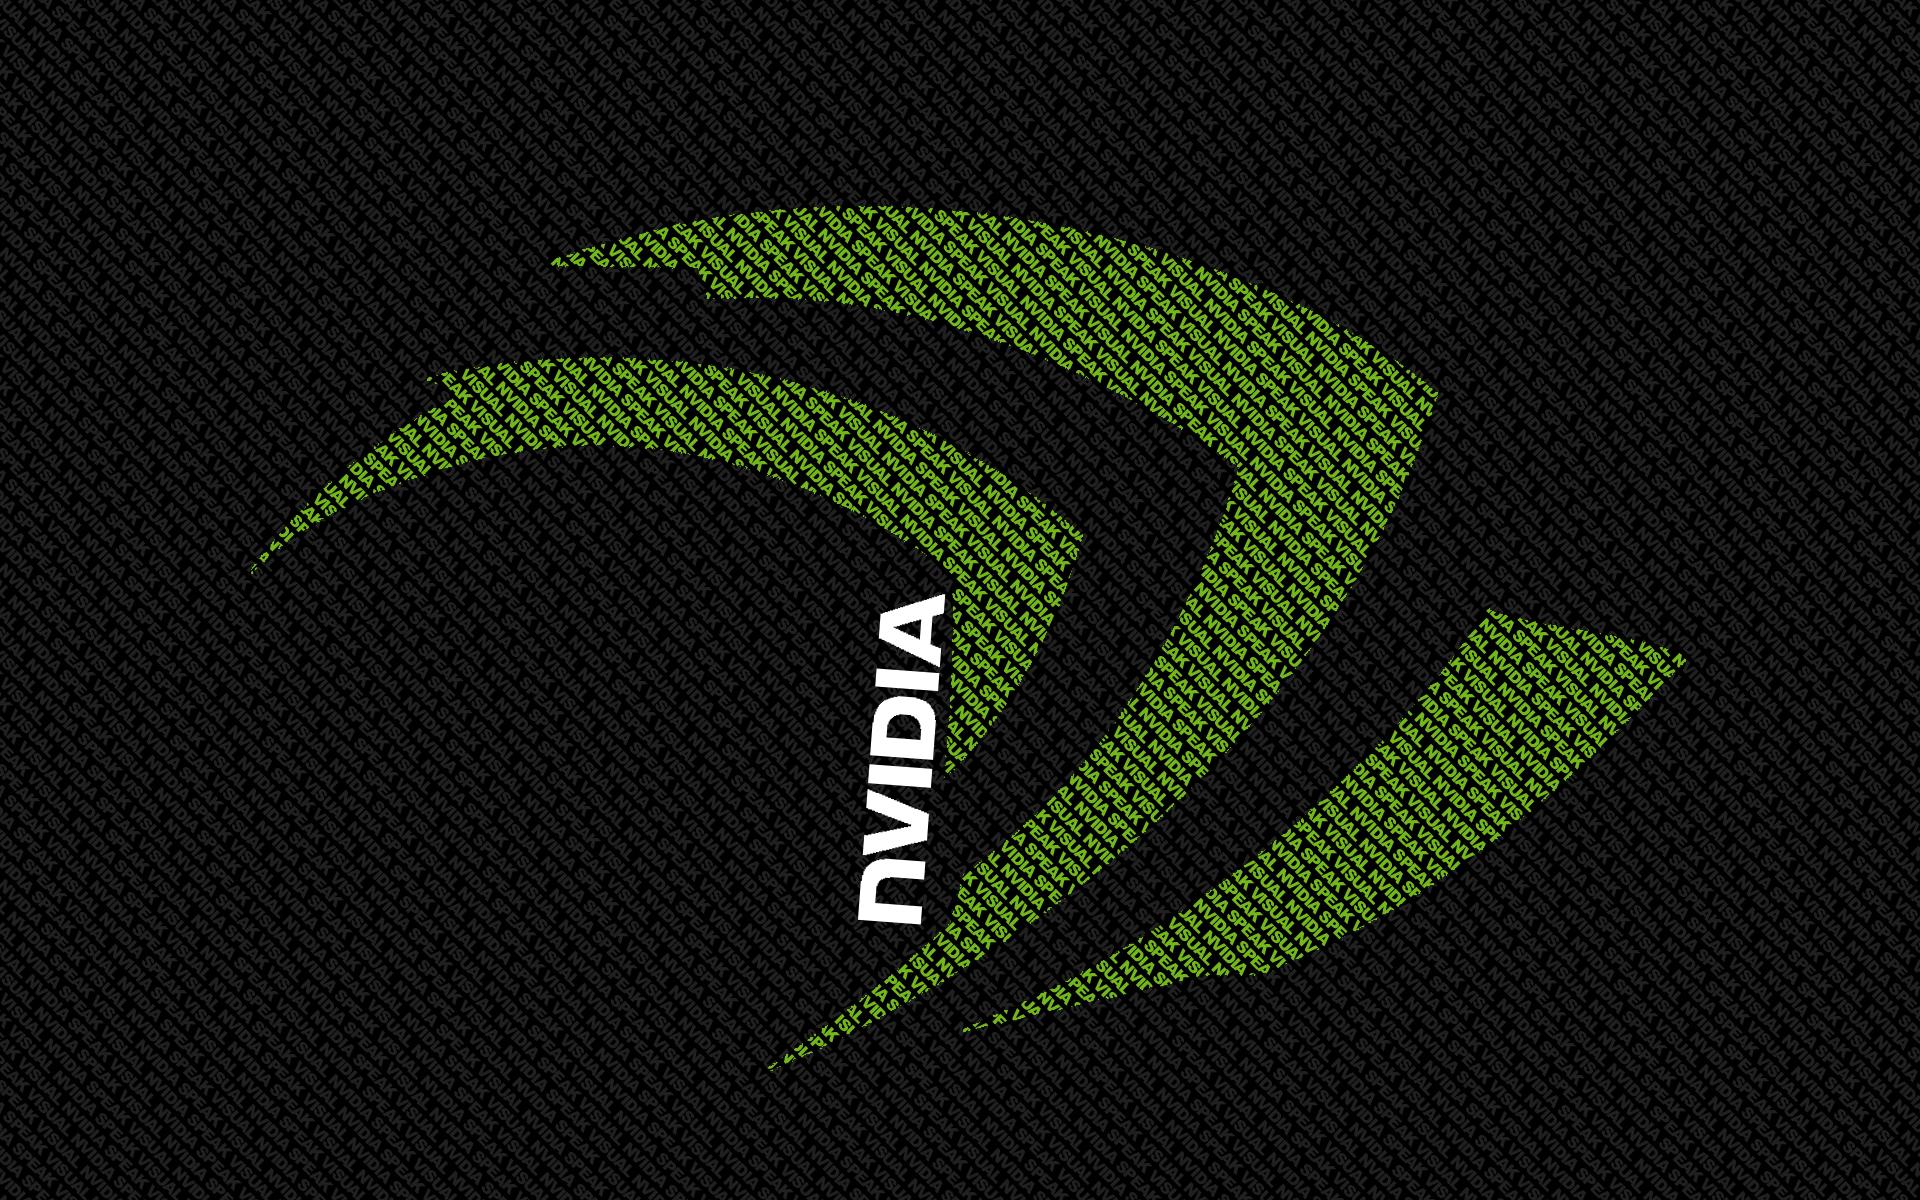 nvidia intel gigabyte wallpaper - photo #17